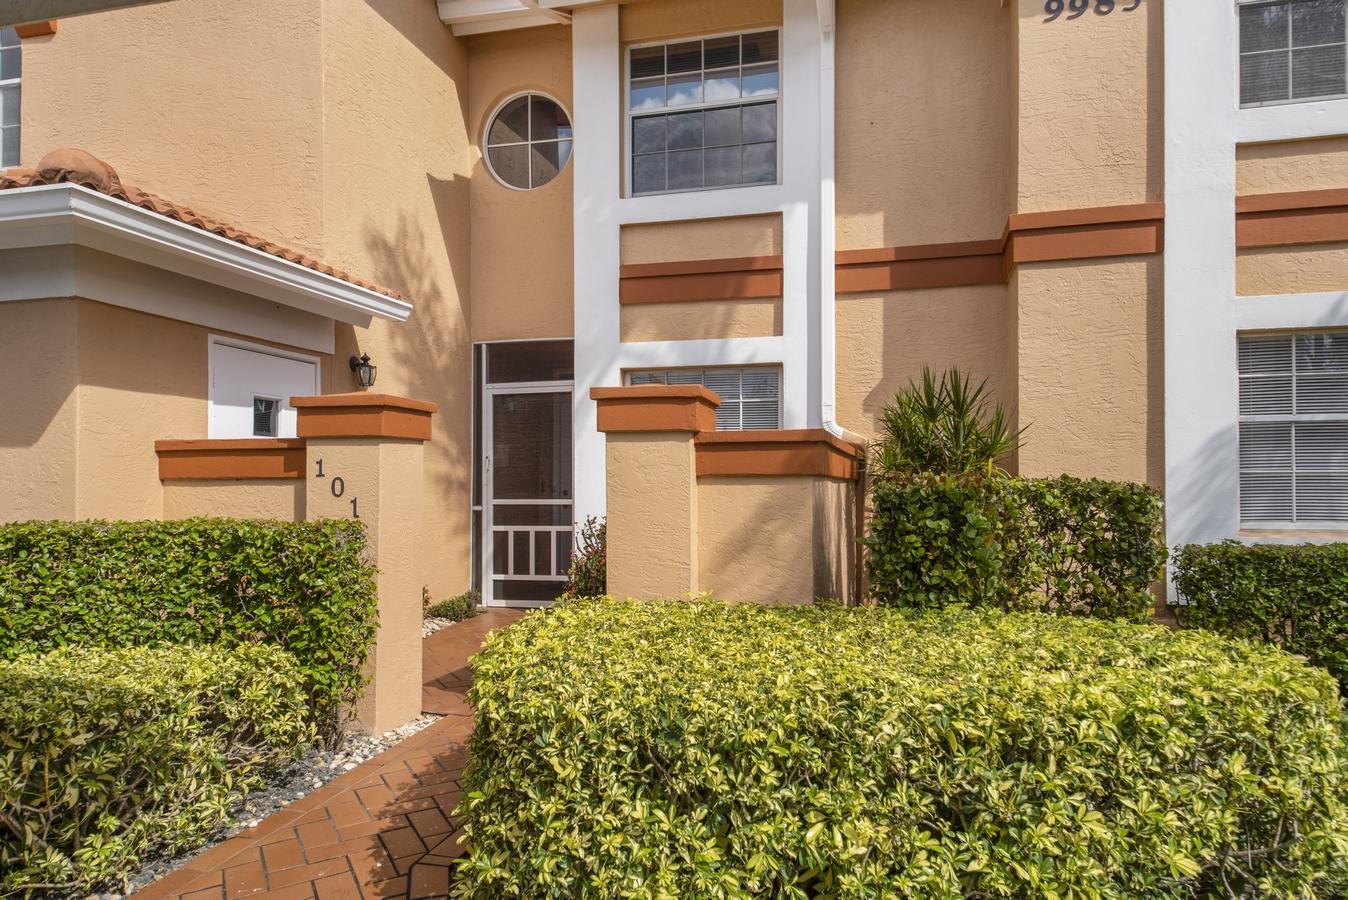 9985 Harbour Lake Circle 101 Boynton Beach, FL 33437 photo 2